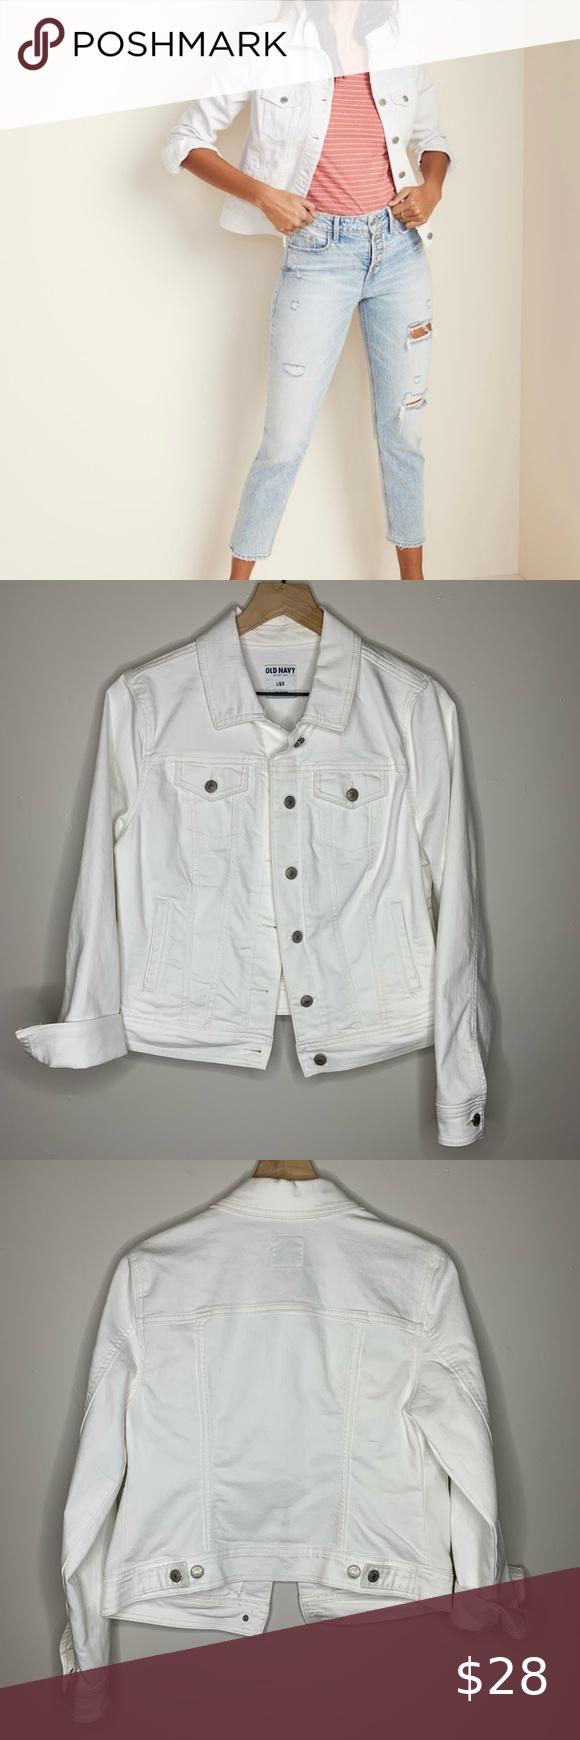 Old Navy White Jean Jacket White Jean Jacket Navy And White Jean Jacket [ 1740 x 580 Pixel ]